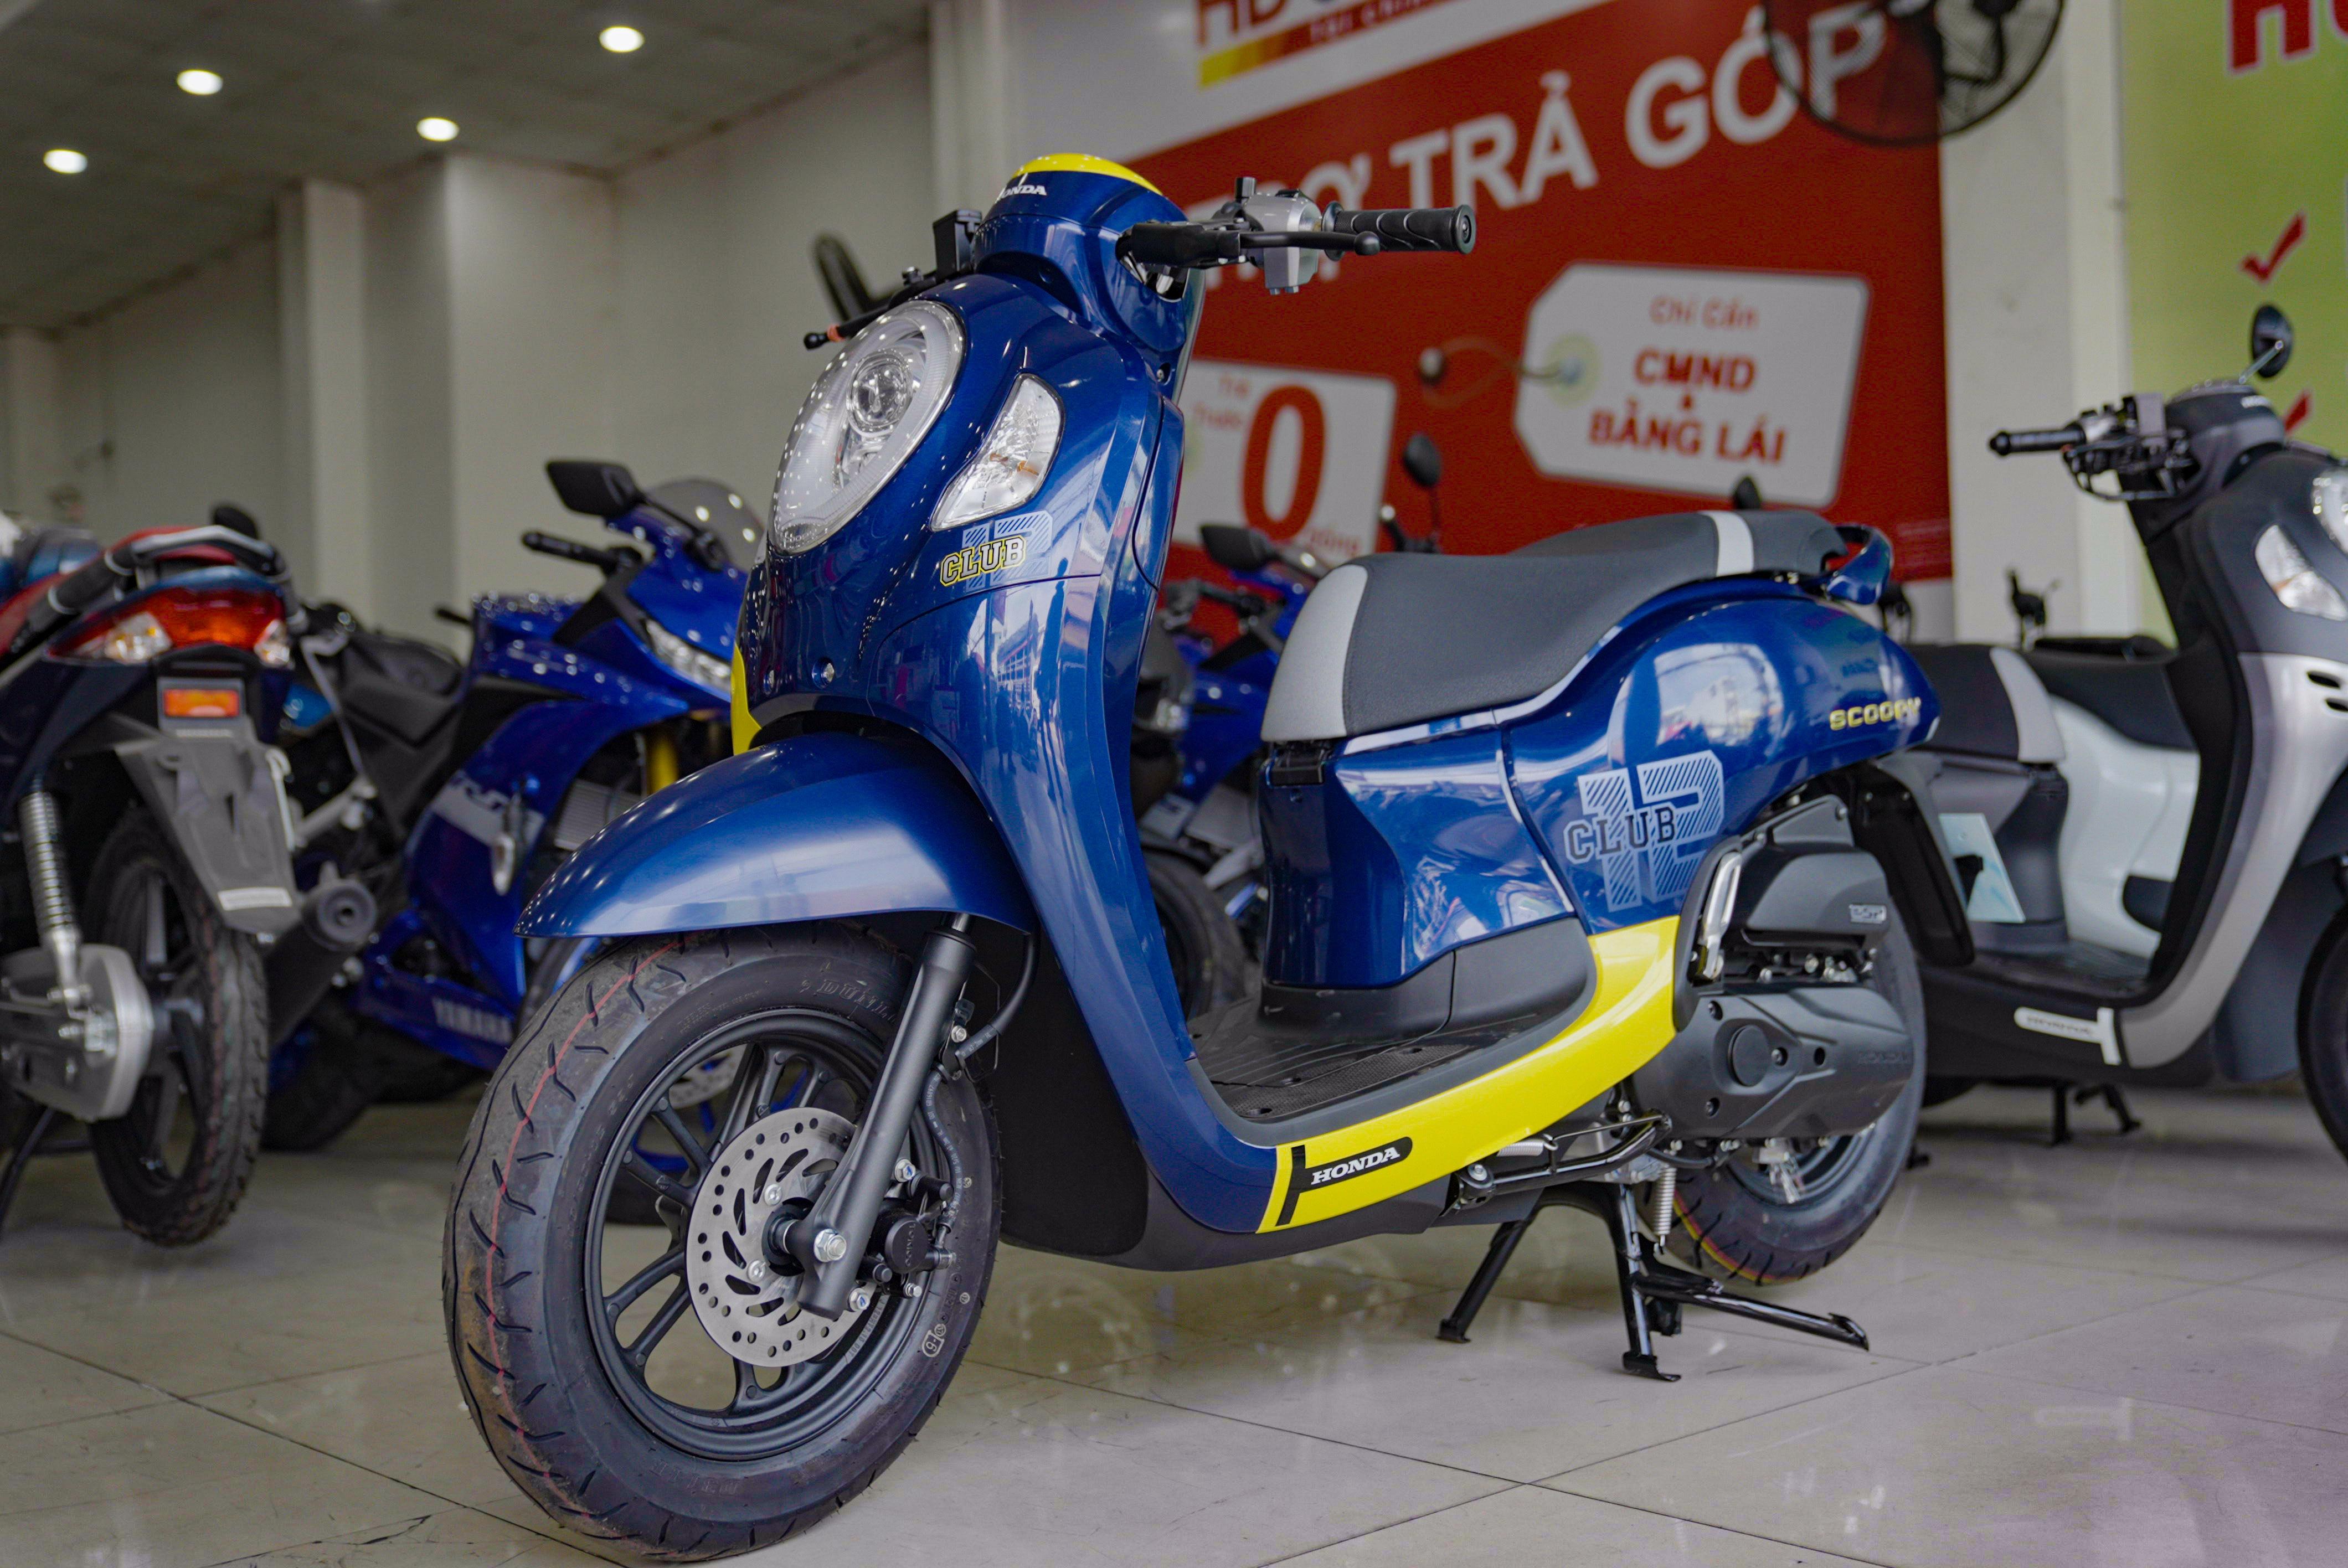 So sanh Honda Scoopy 2021 va Yamaha Janus anh 1